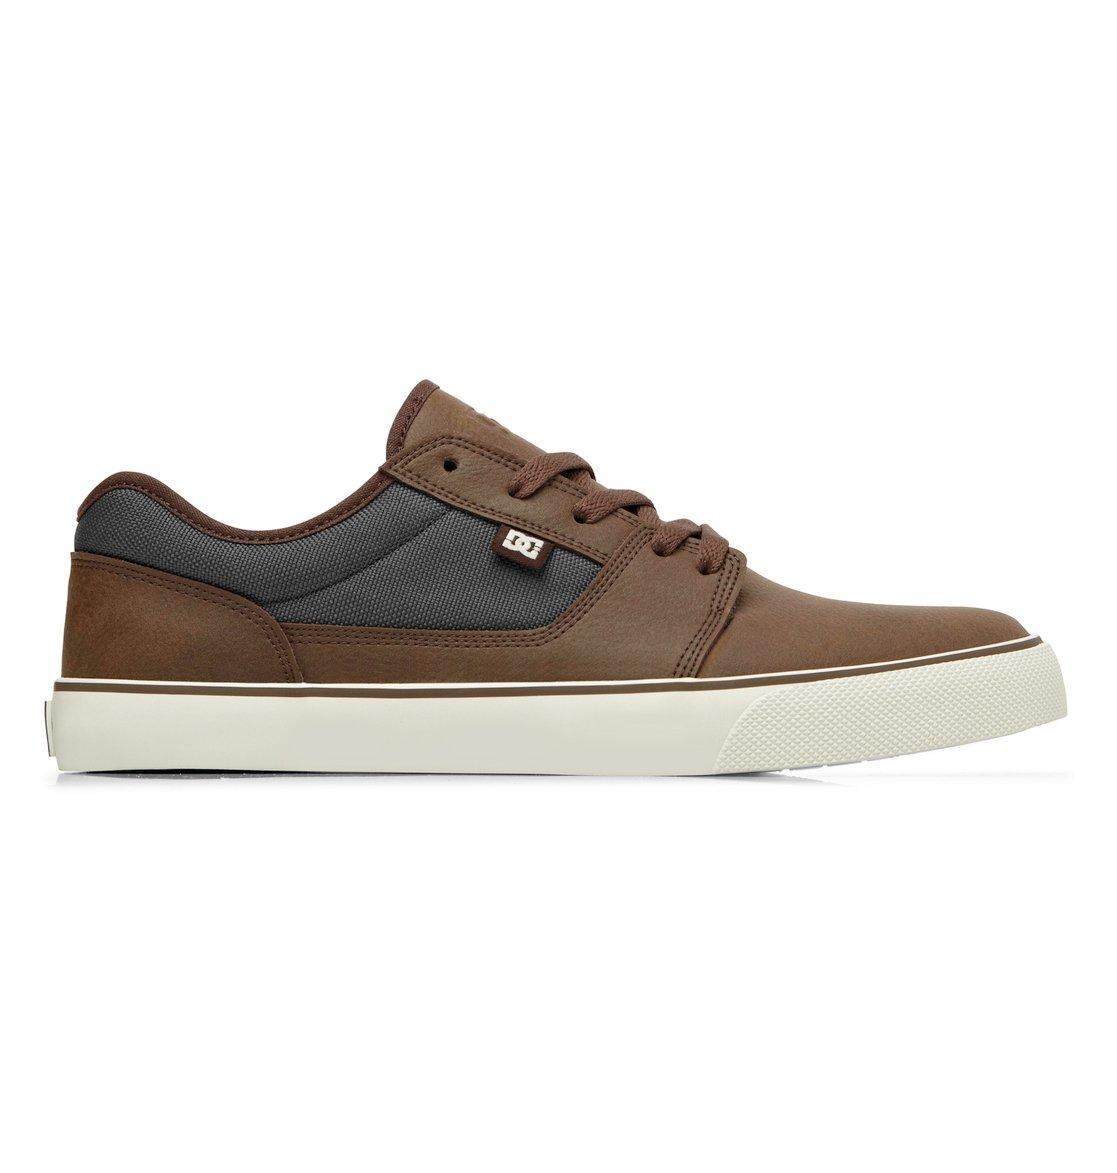 Dc Men s Tonik Se Skateboarding Shoe   754YPNLIP